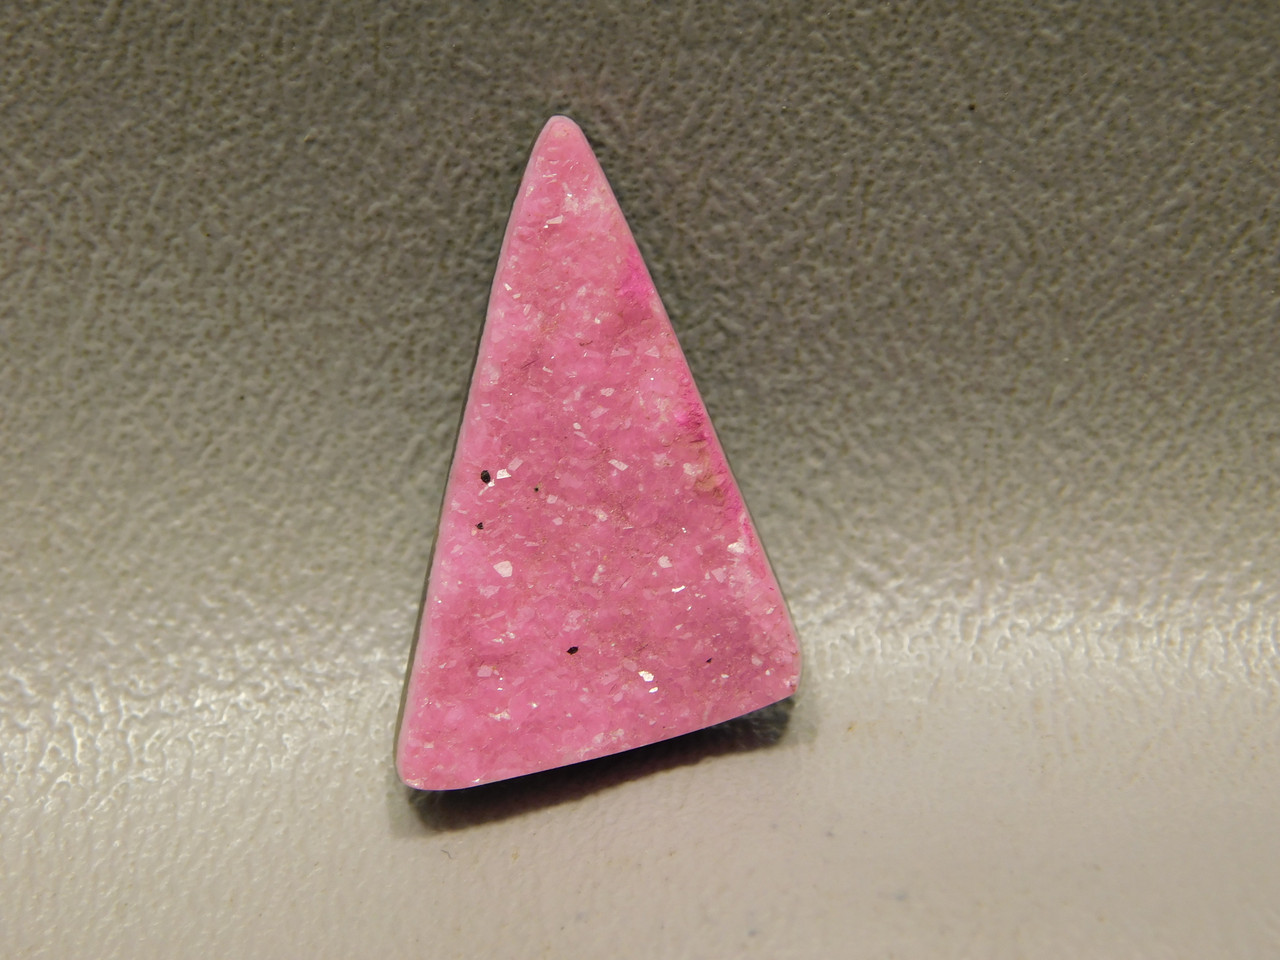 Cobalto Calcite Pink Drusy Crystal Designer Gemstone Cabochon #12